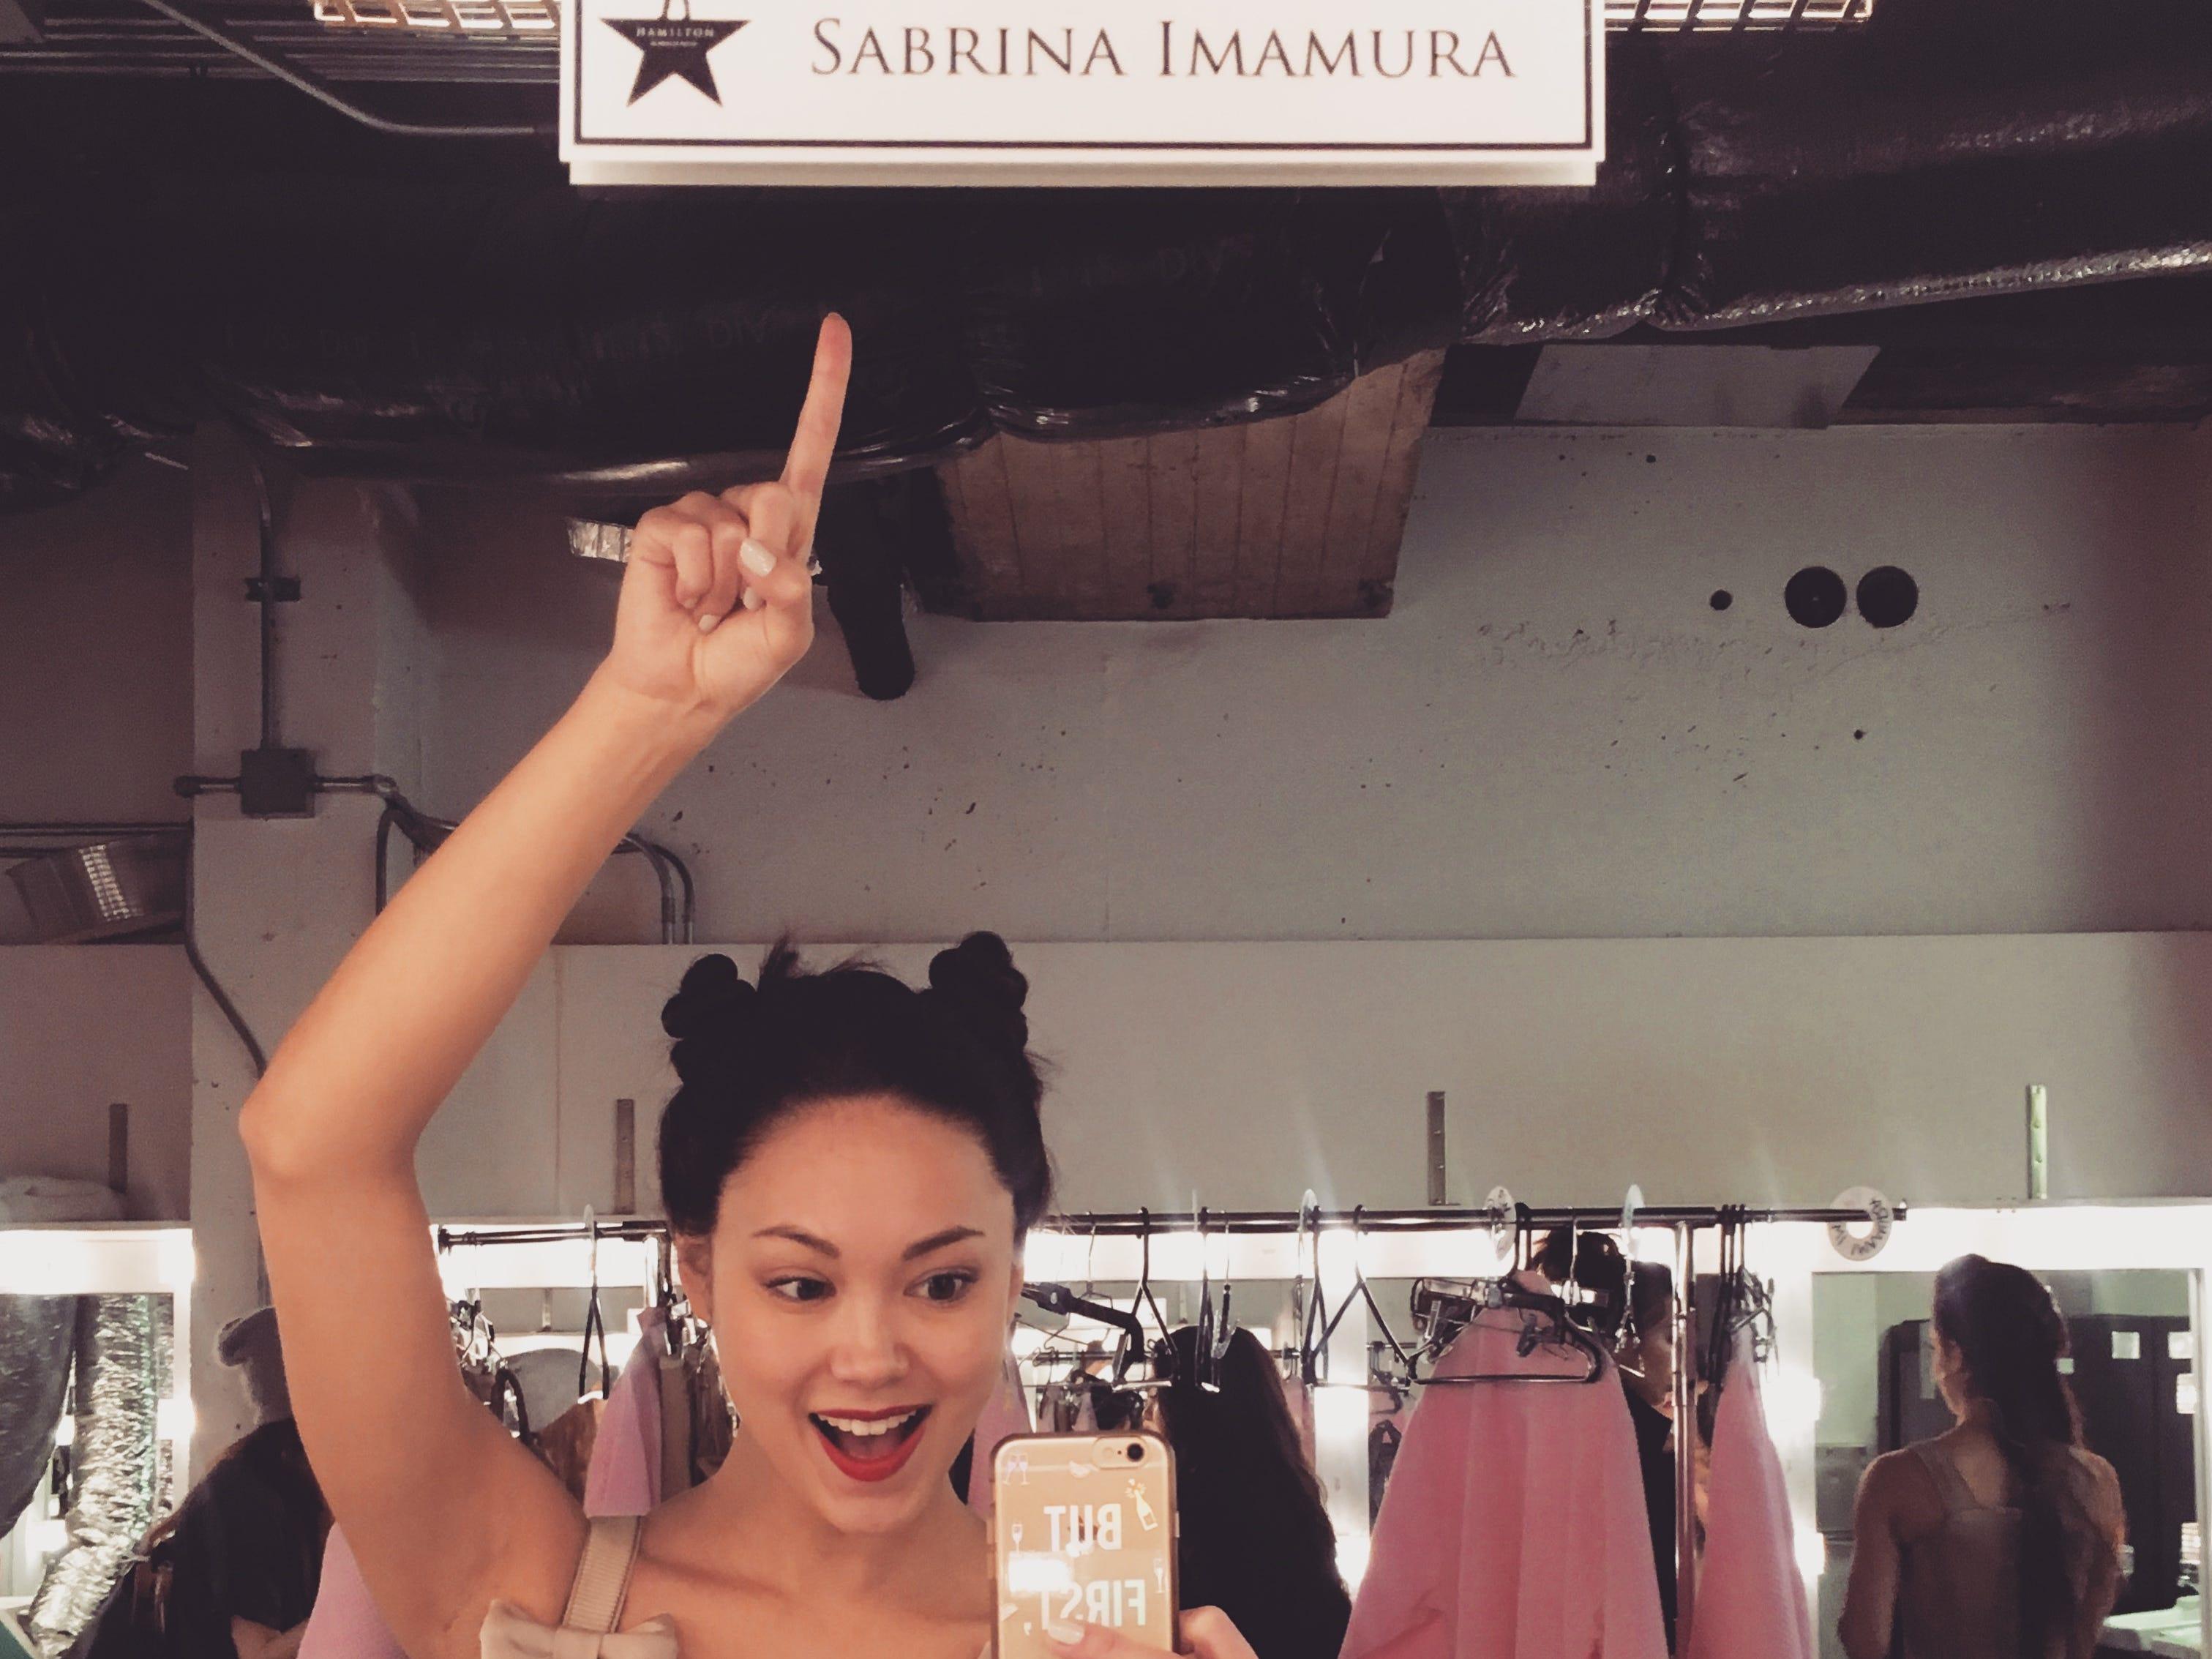 Sabrina Imamura takes a backstage selfie.